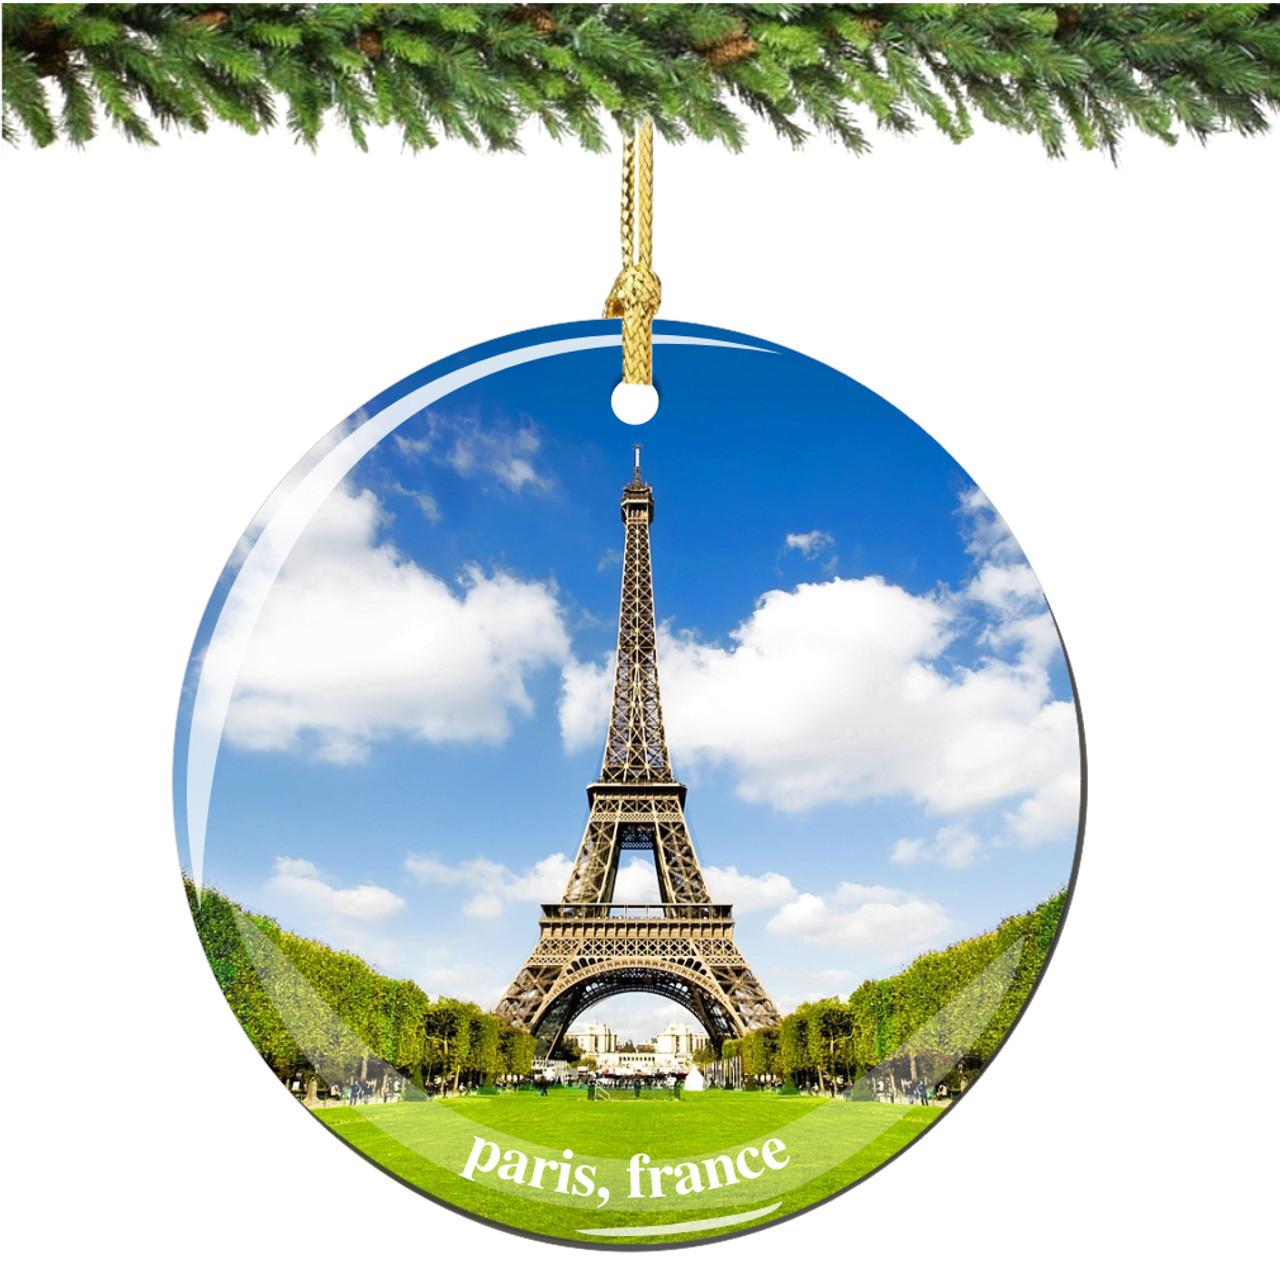 Eiffel Tower Porcelain Christmas Ornament